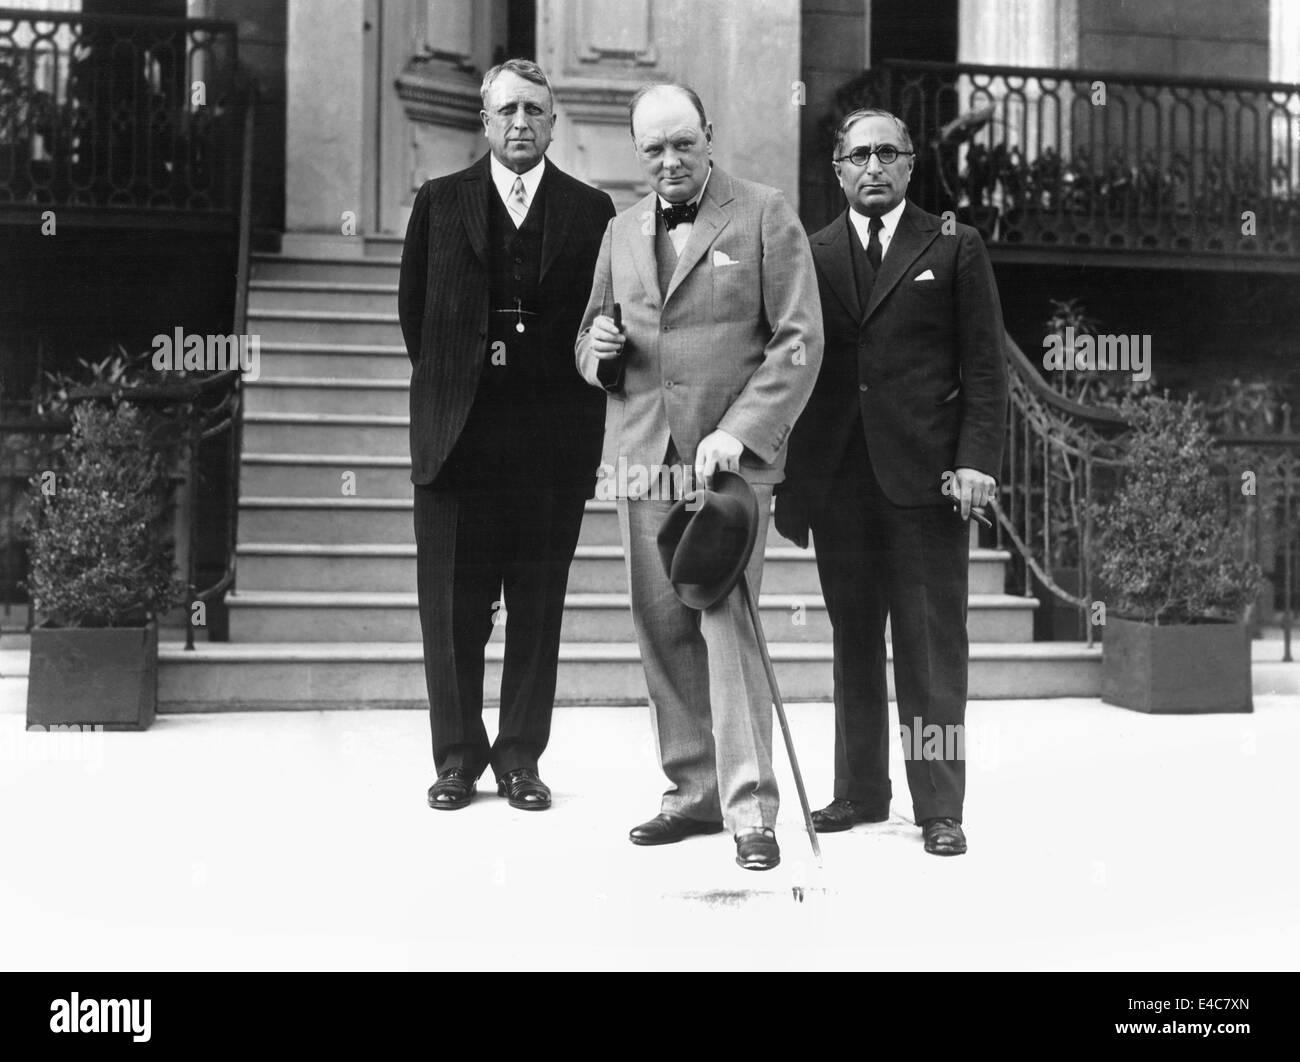 William Randolph Hearst, Winston Churchill, Louis B. Mayer, Portrait, circa 1930s - Stock Image